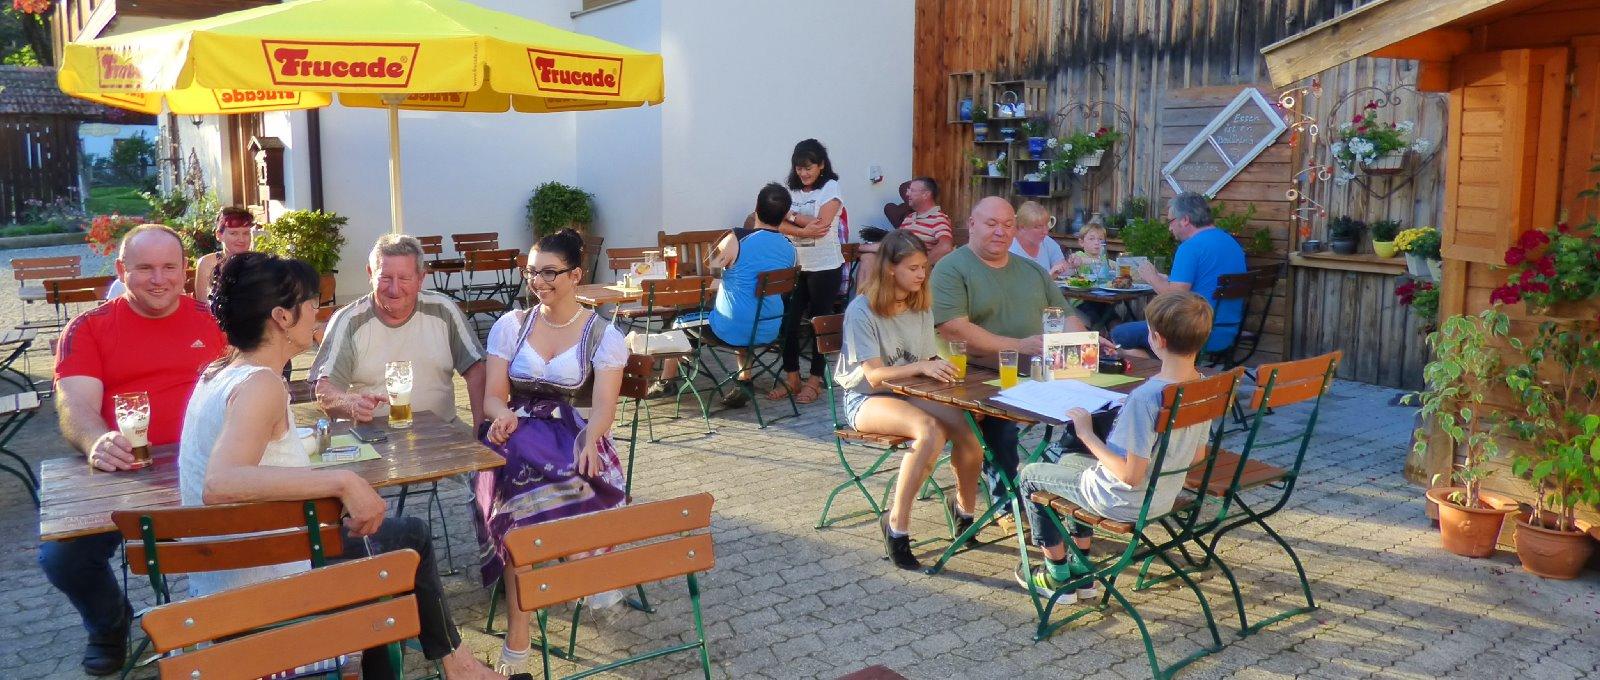 dorfwirt-arnbruck-biergarten-ausflugslokal-bayerischer-wald